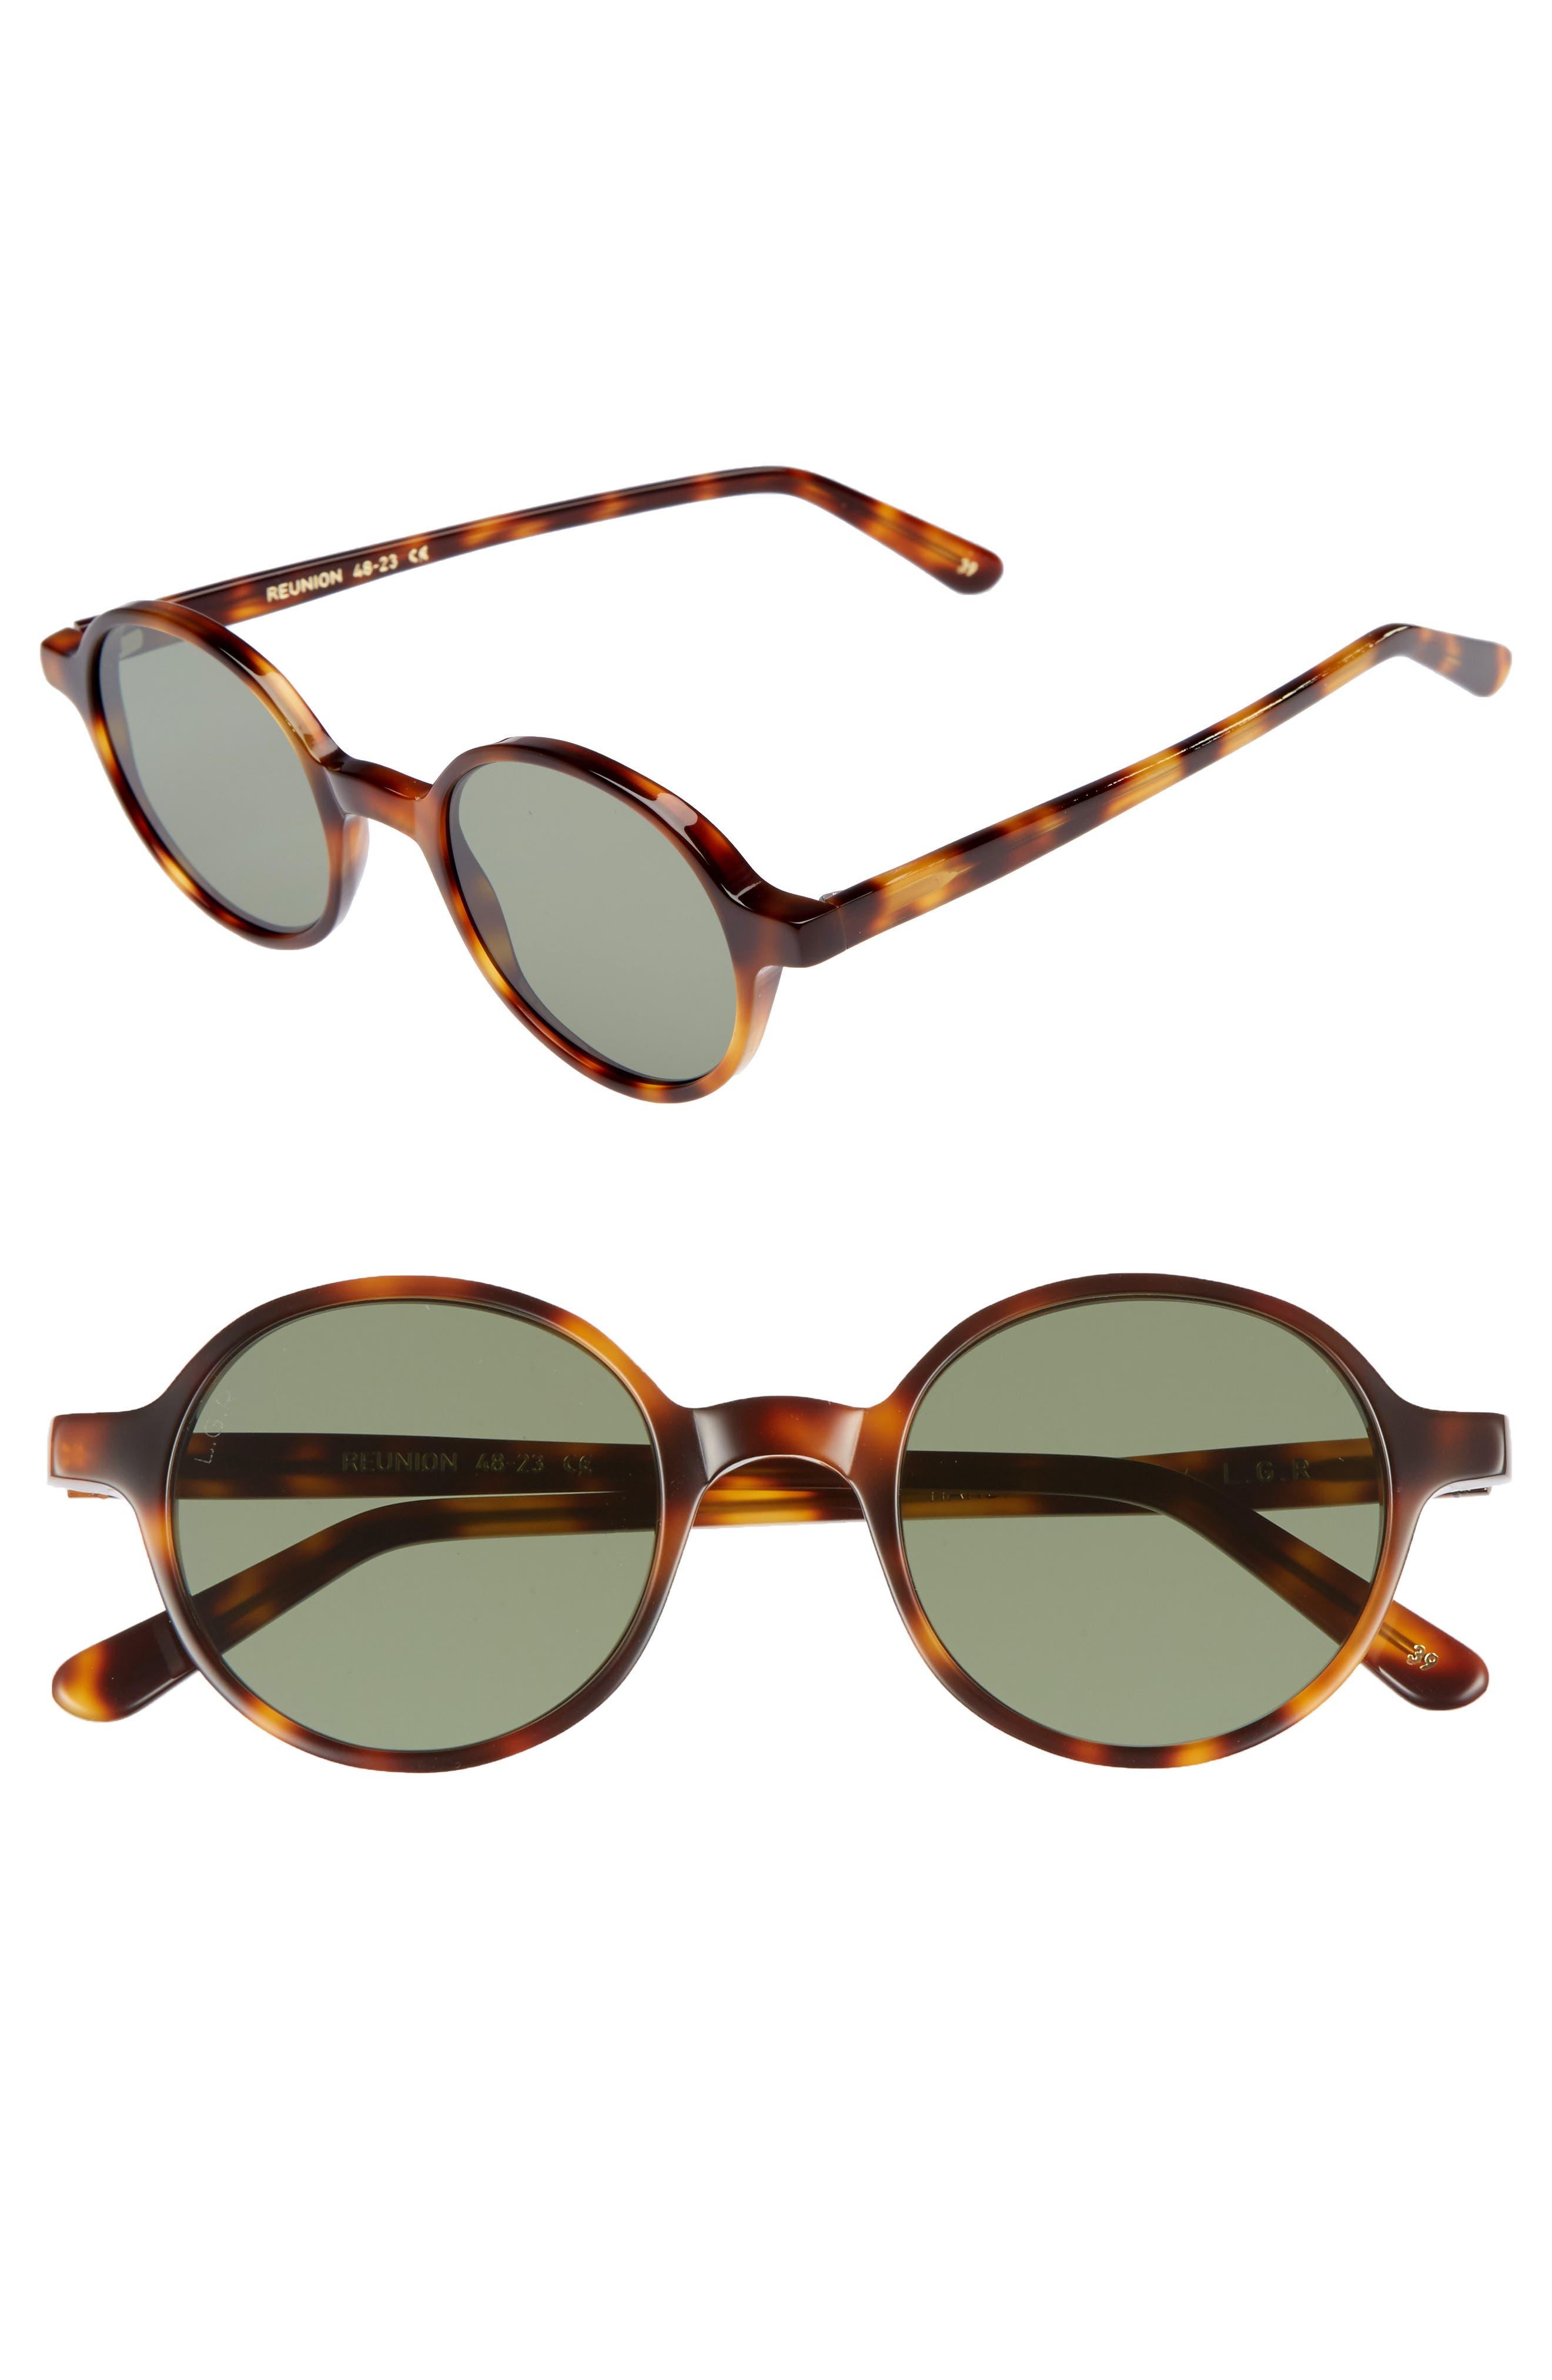 Reunion 48mm Sunglasses,                             Main thumbnail 1, color,                             200